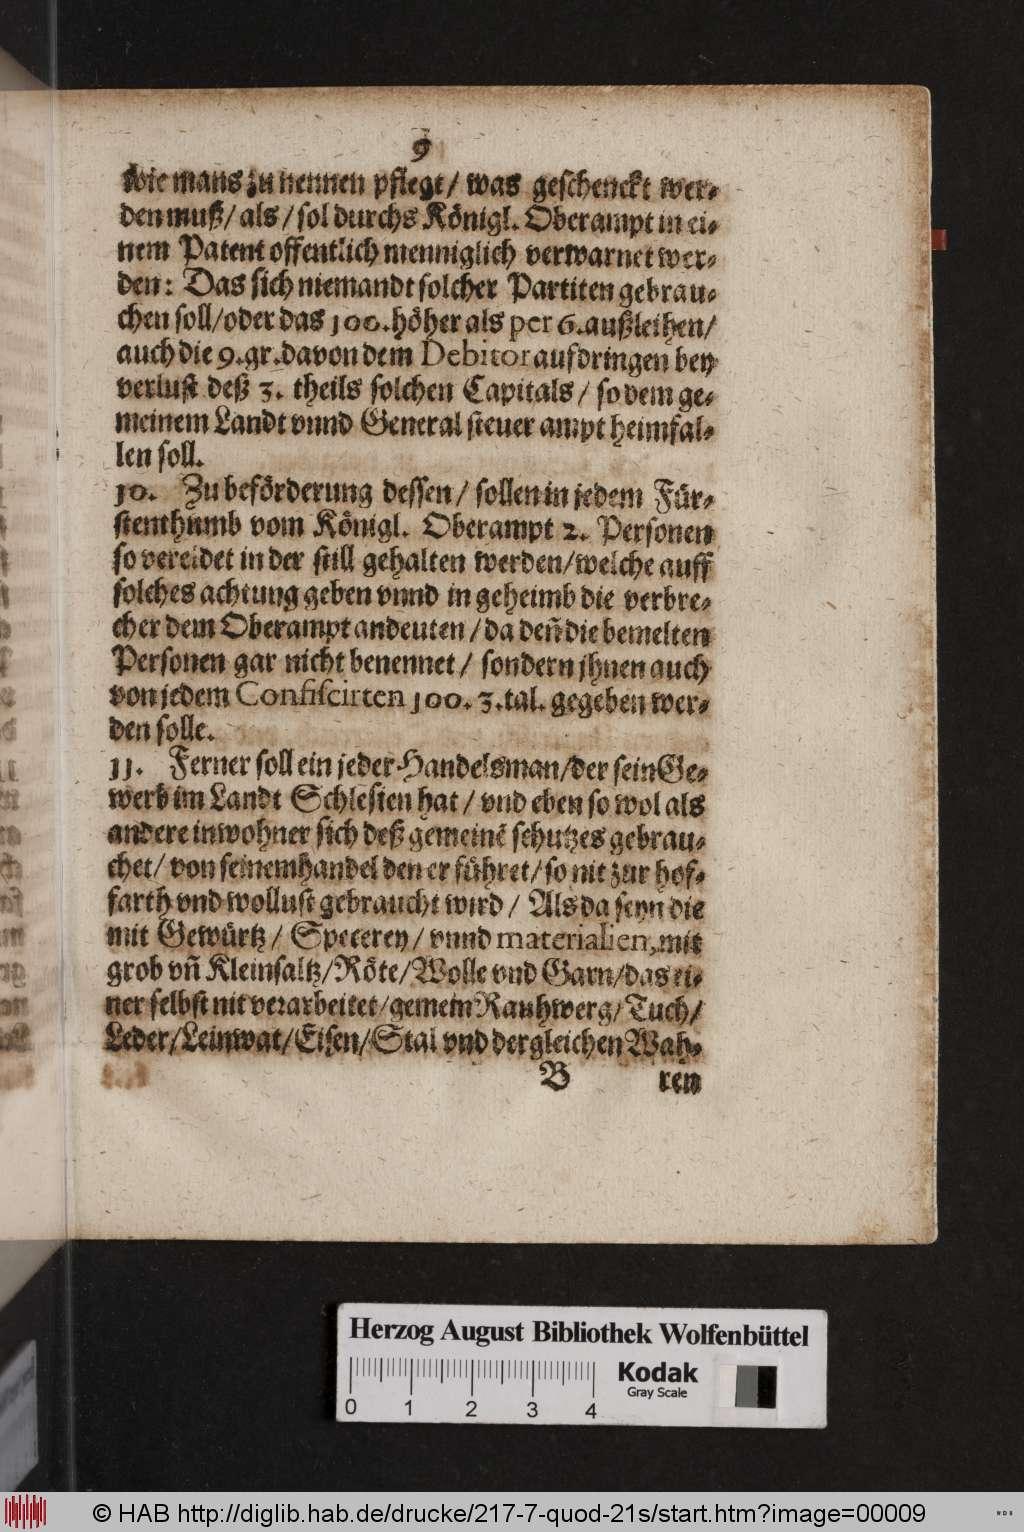 http://diglib.hab.de/drucke/217-7-quod-21s/00009.jpg